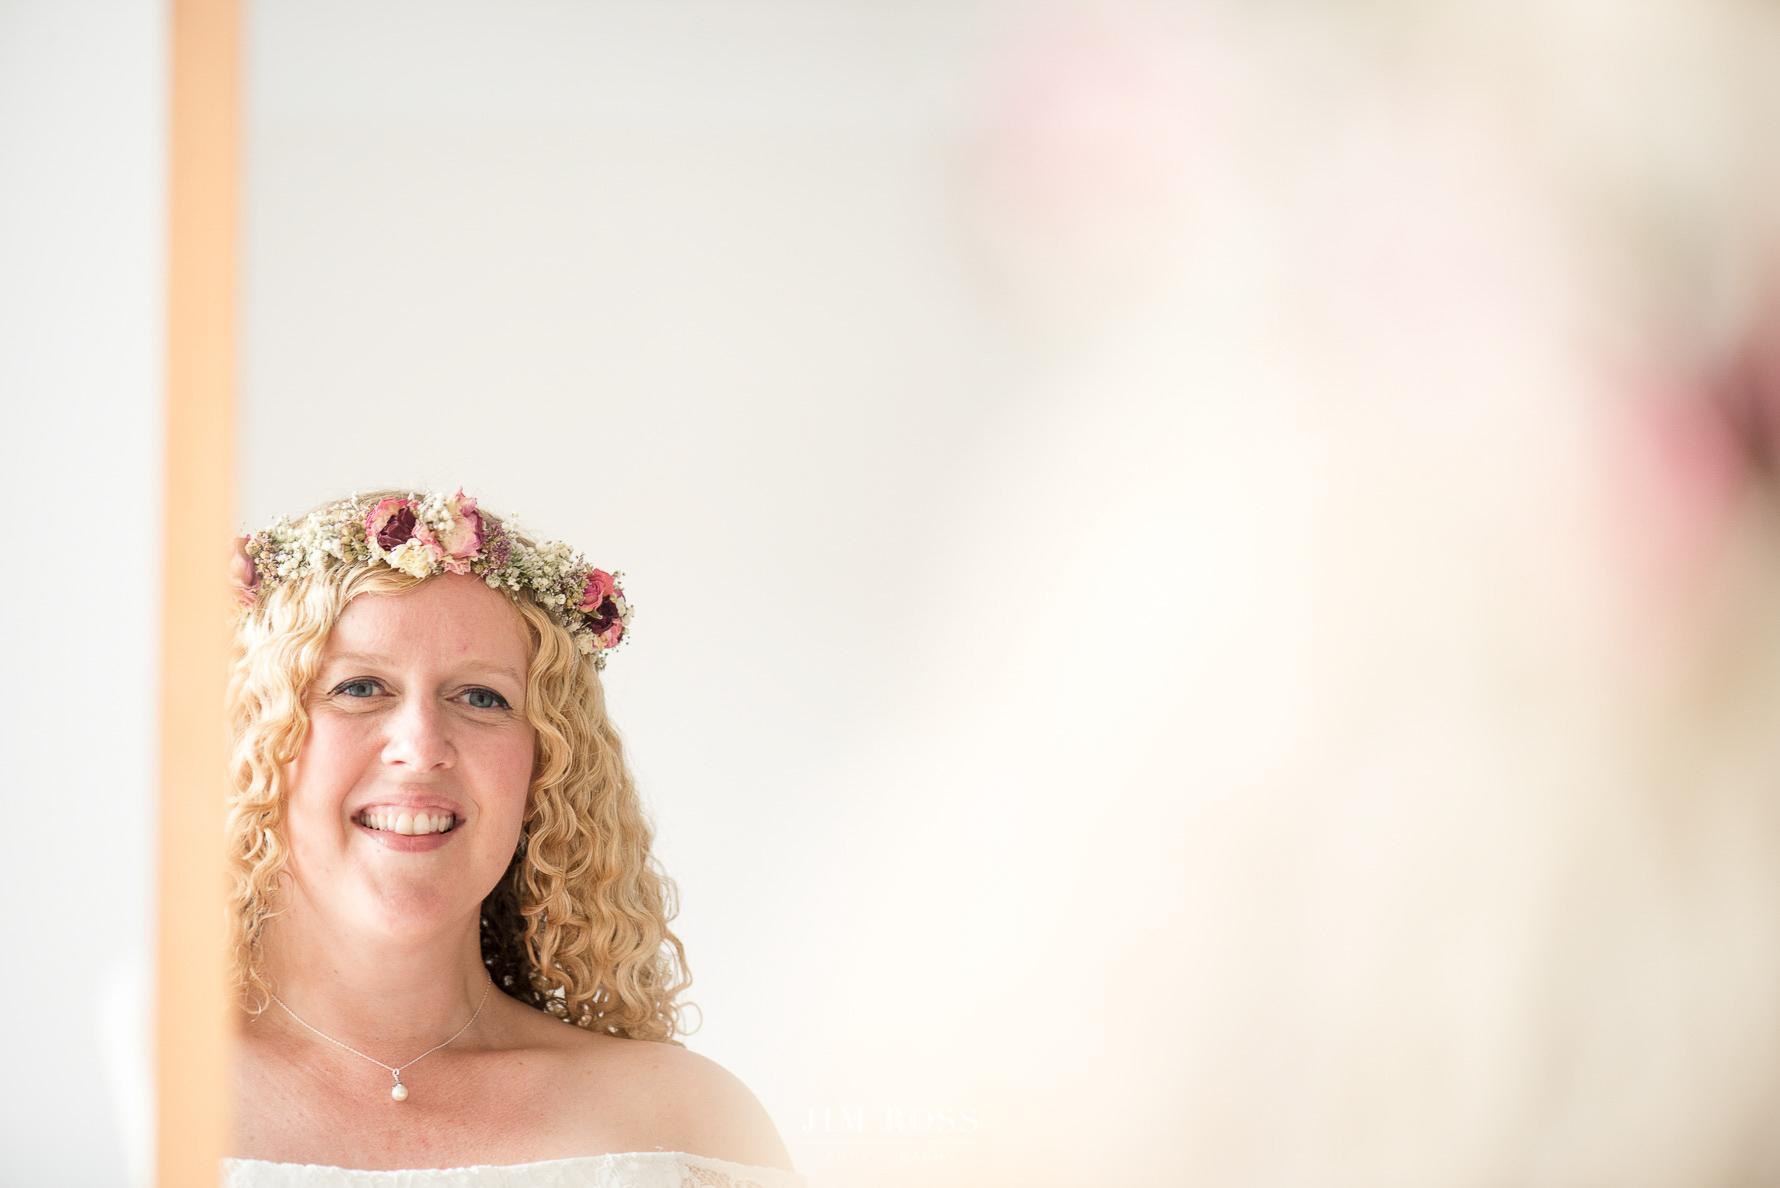 Bride with dried flower garland